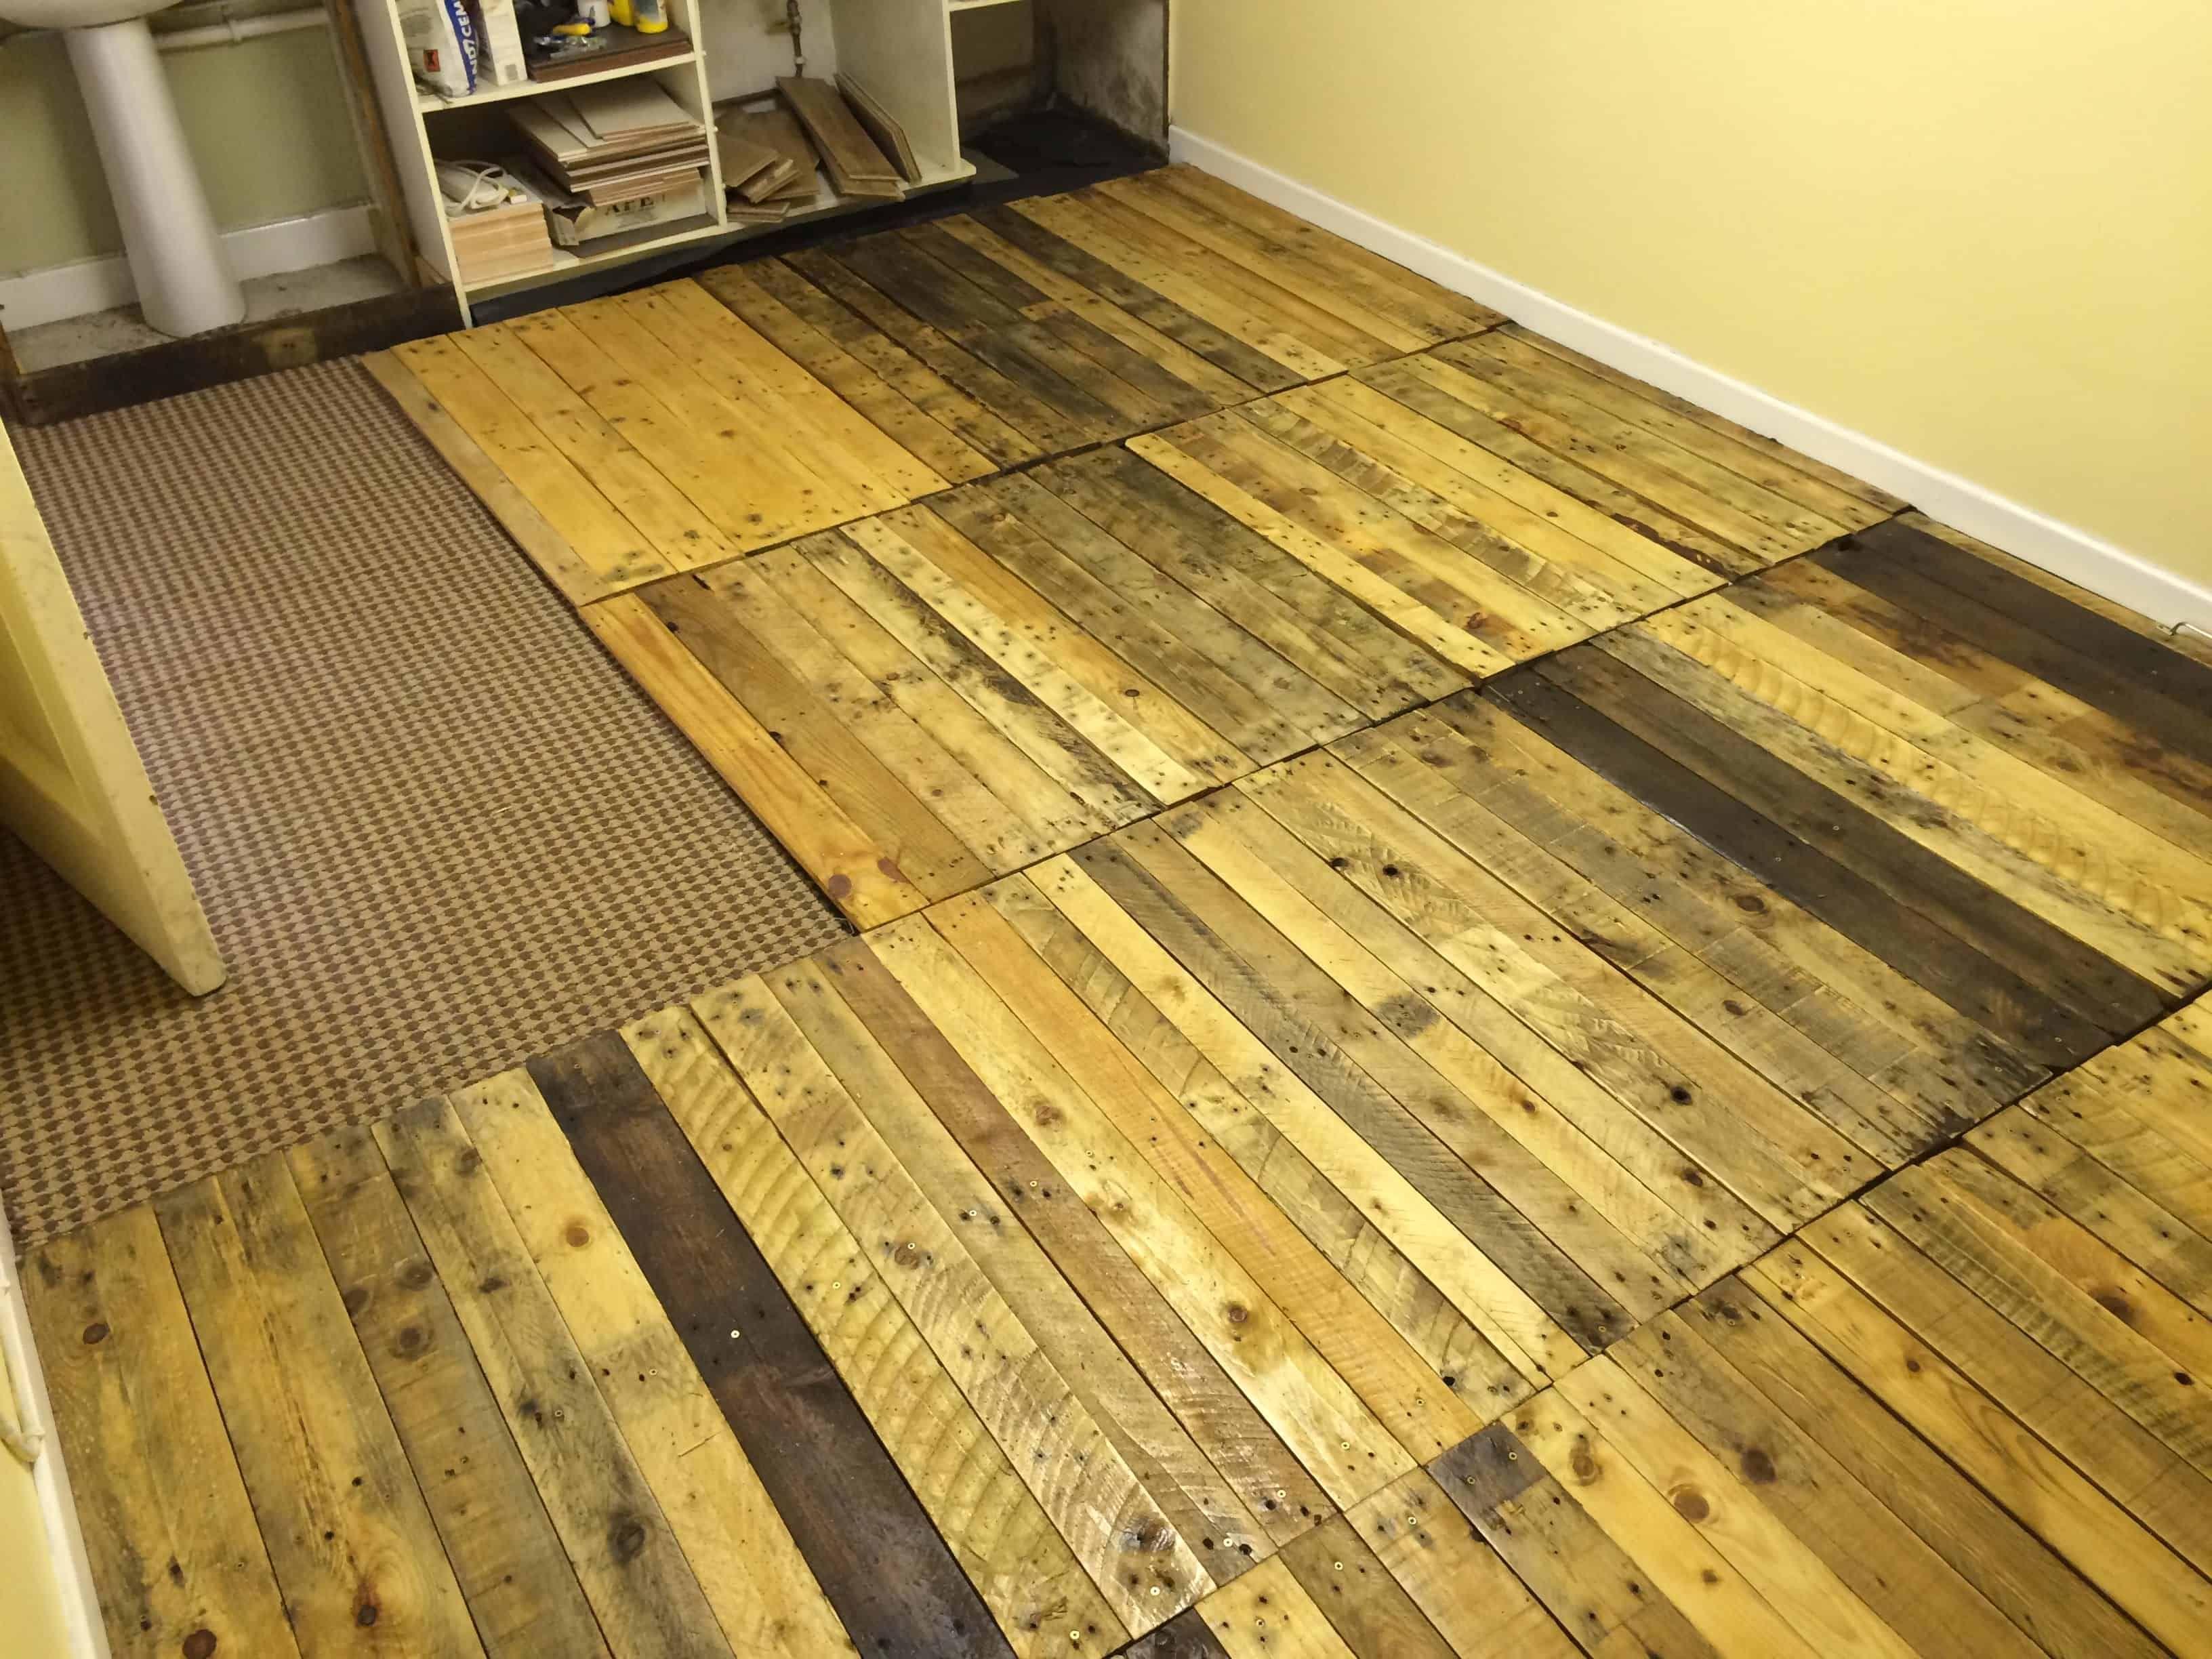 Removable Pallet Kitchen Floor • 9 Pallets   Pallet floors ...